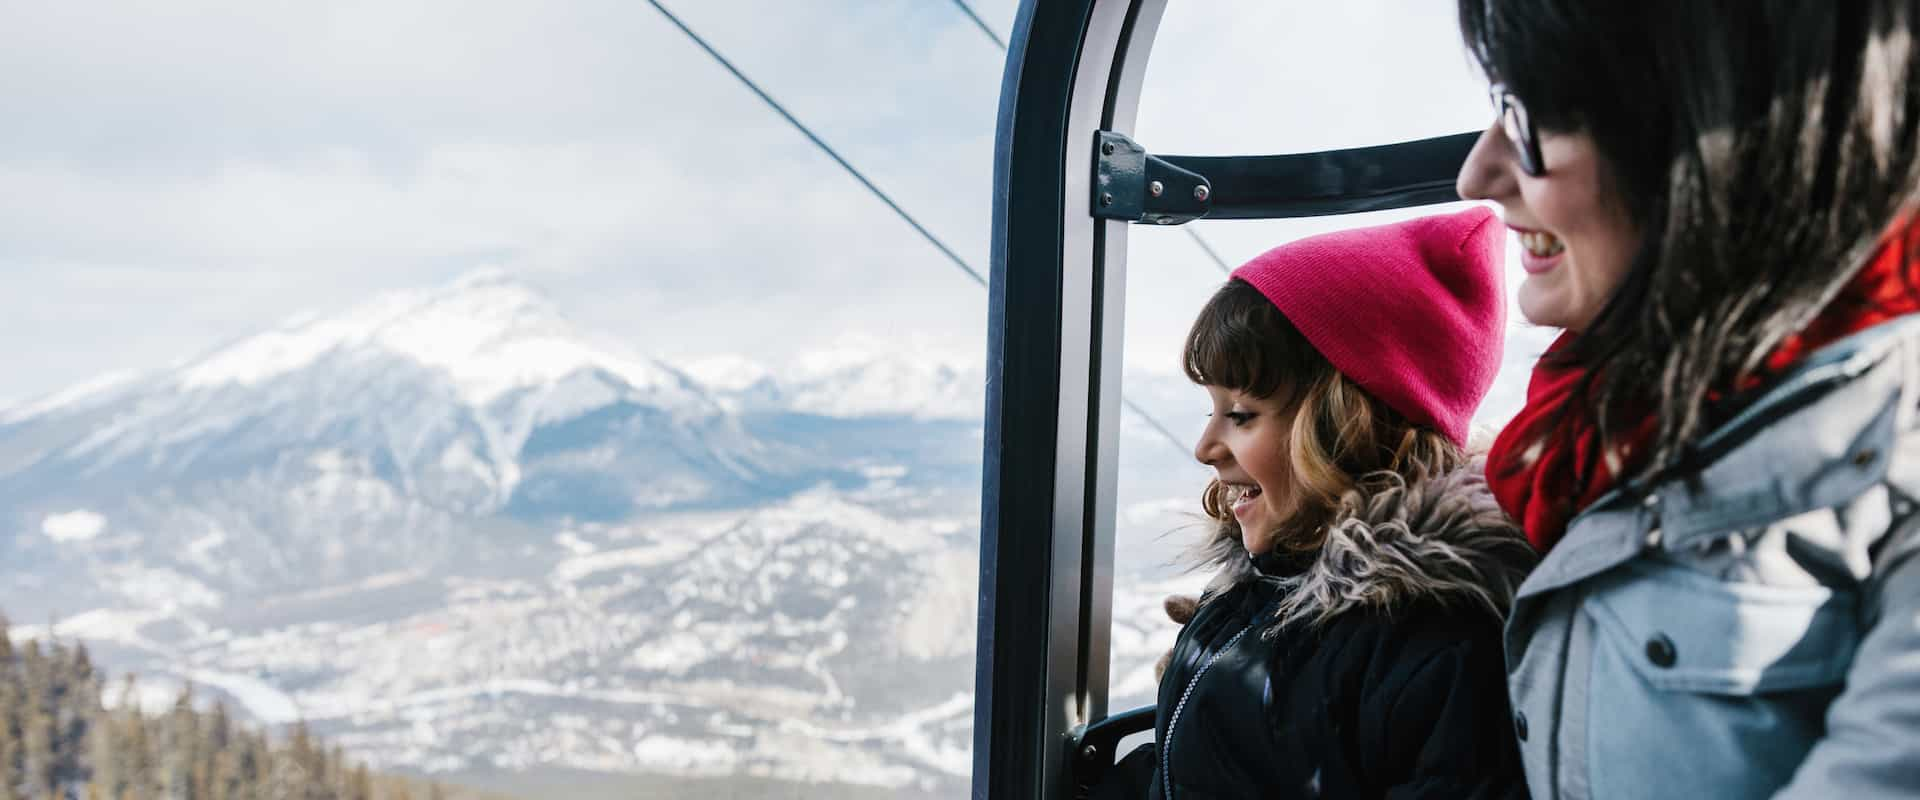 Sleigh Ride + Hot Springs + Gondola